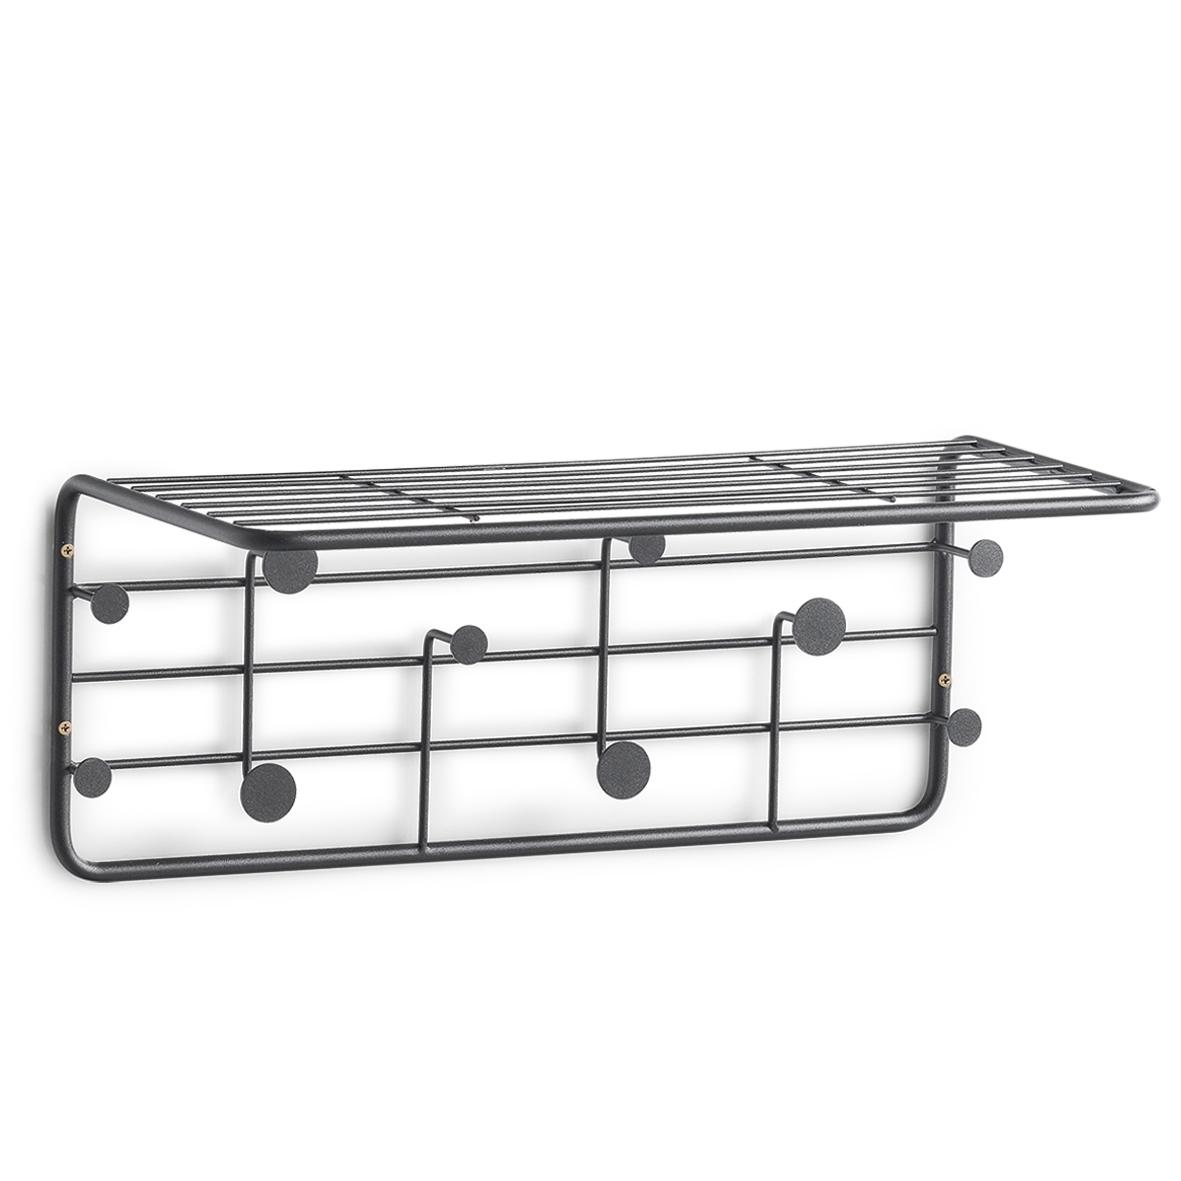 Cuier metalic cu etajera, Rack Negru, l51,4xA24xH21 cm somproduct.ro